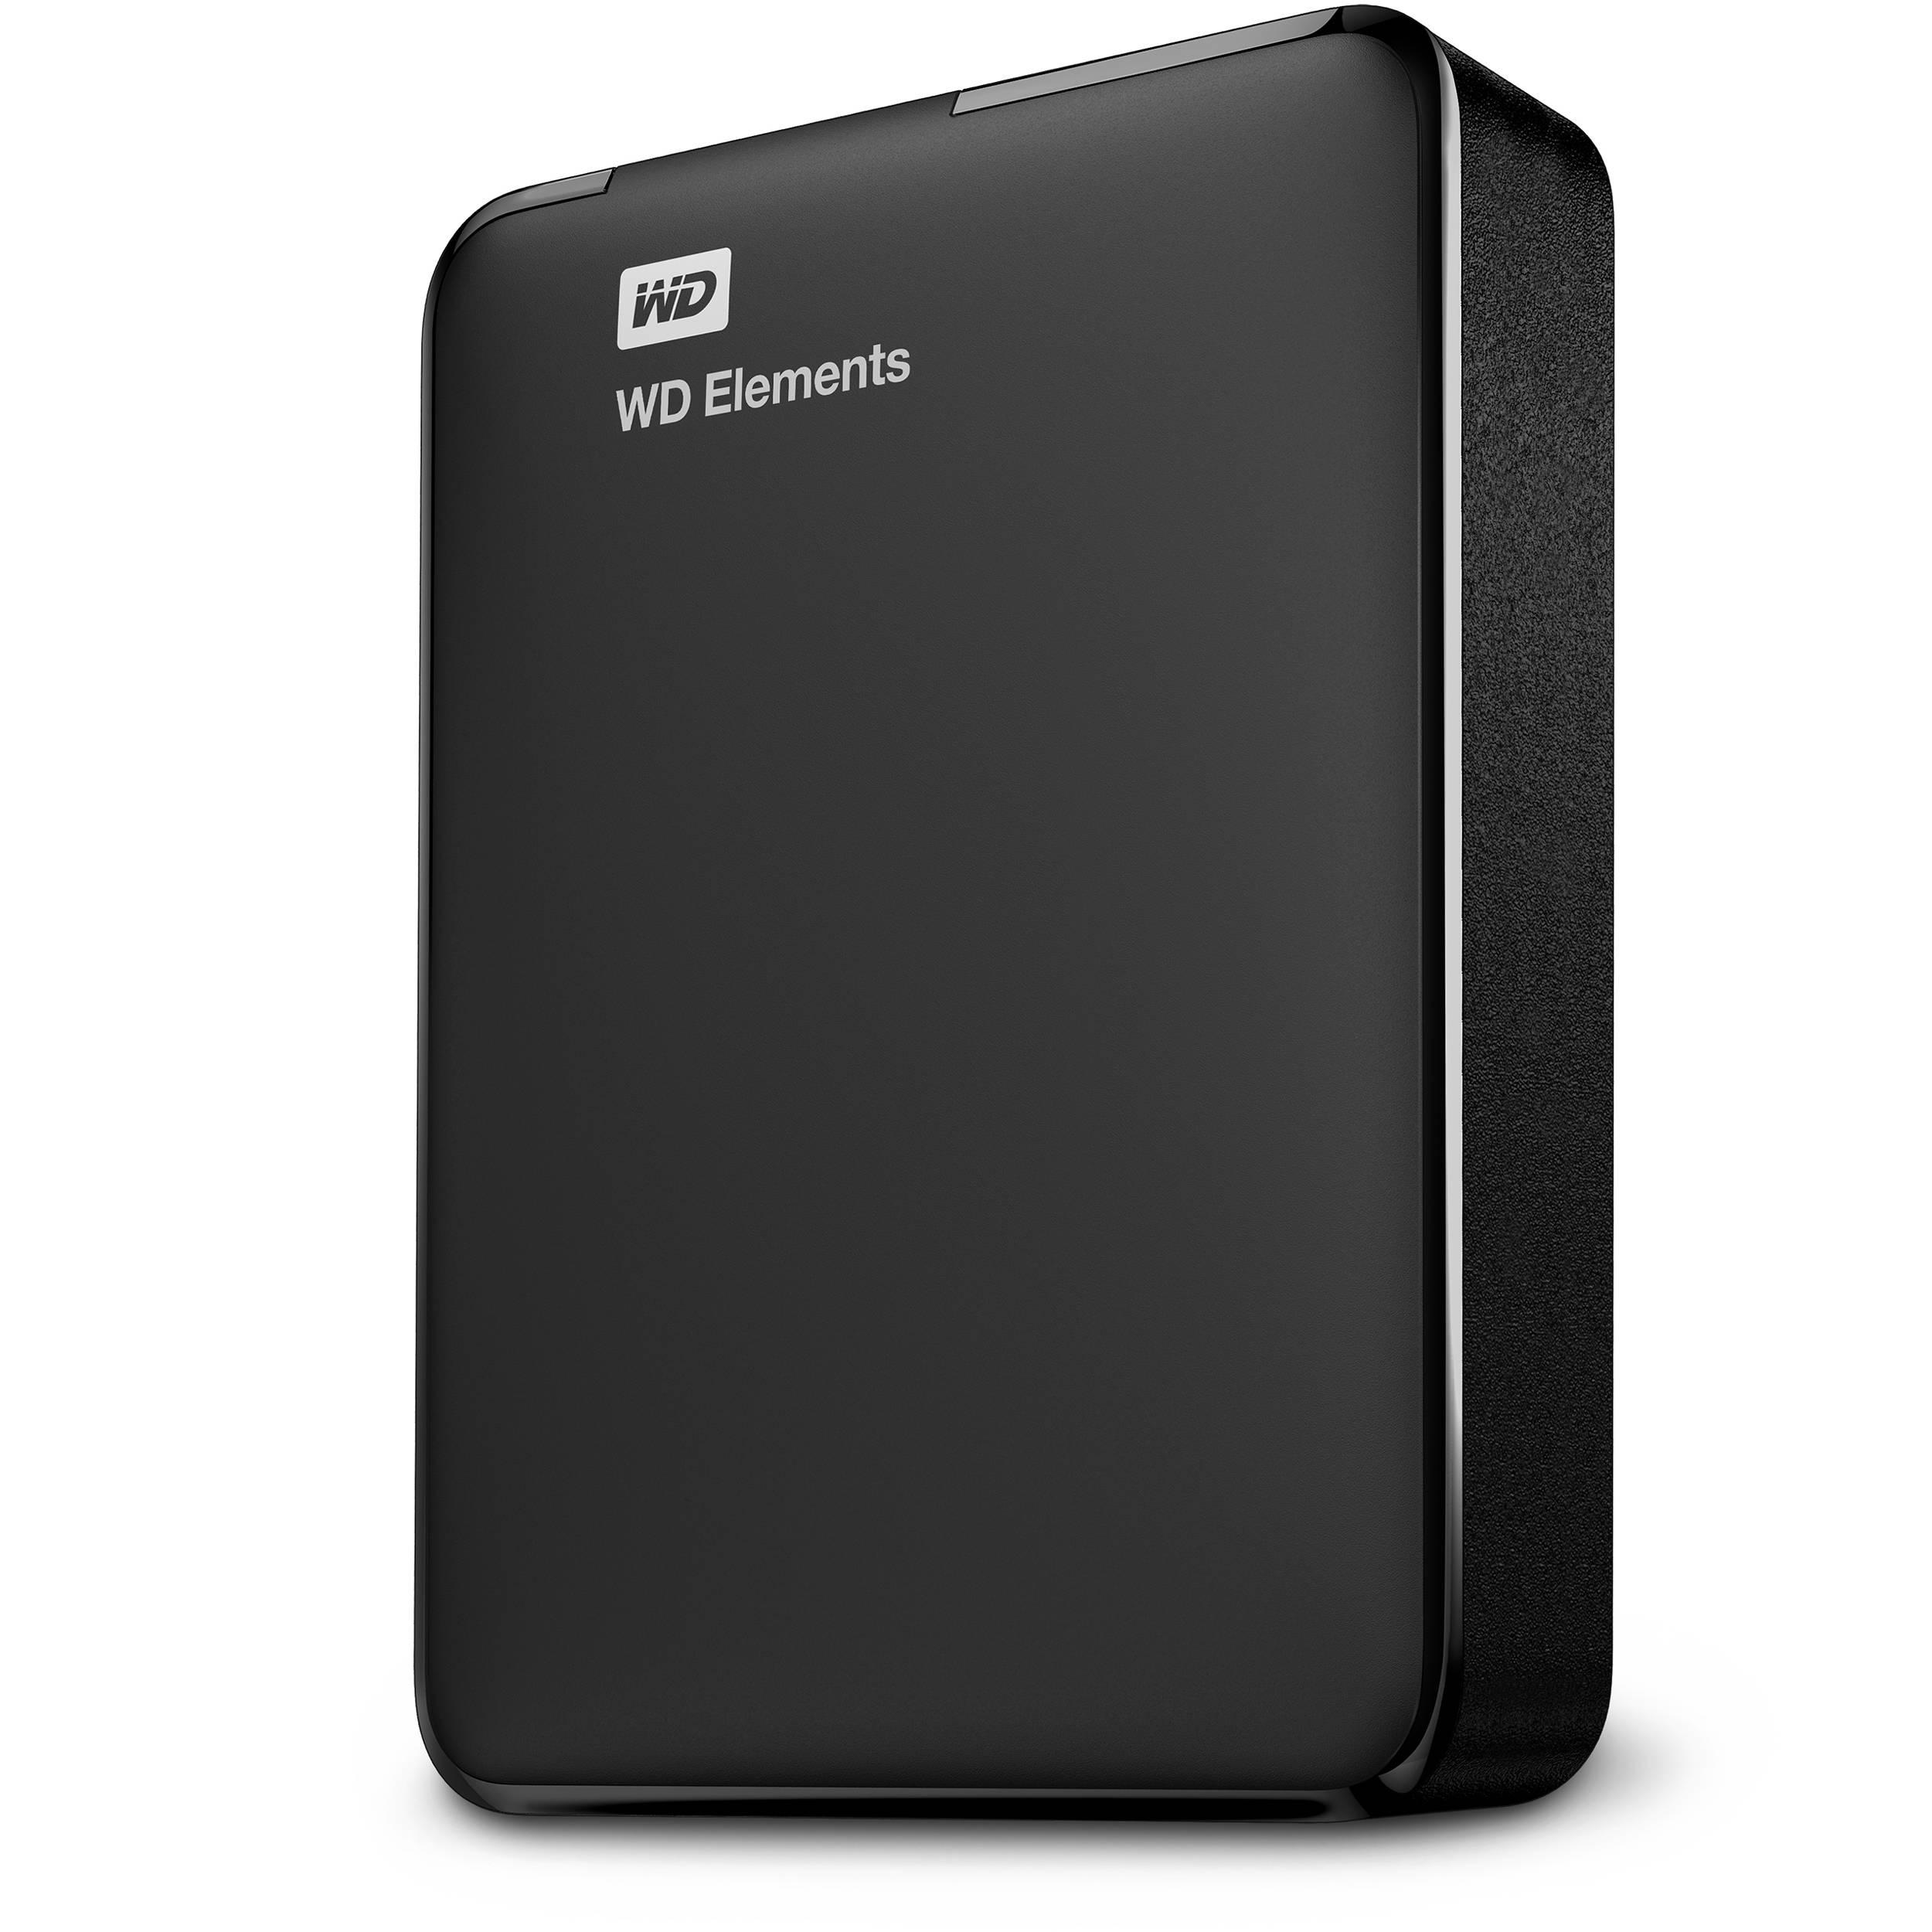 Wd 3tb Elements Usb 3 0 External Hard Drive Wdbu6y0030bbk Eesn